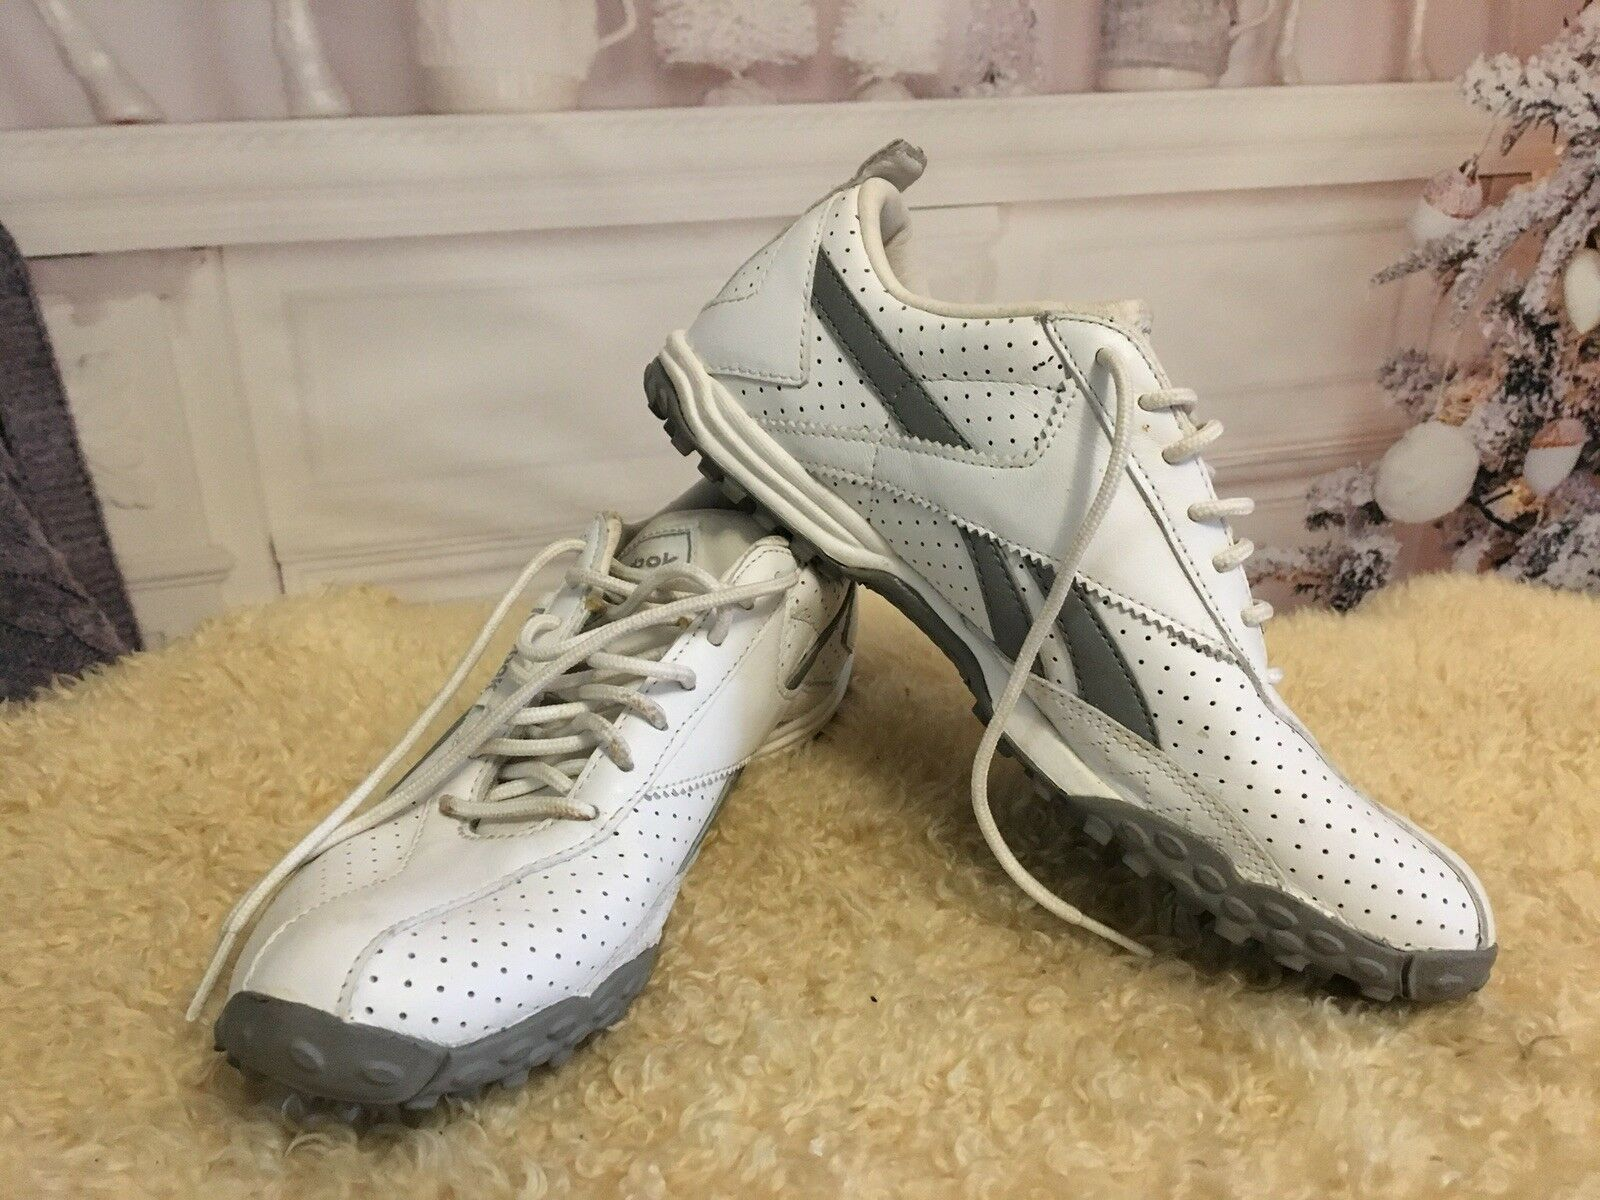 Reebok Women's White Grey Sneakers RB 602DJI 1-111523 Size 7 ½